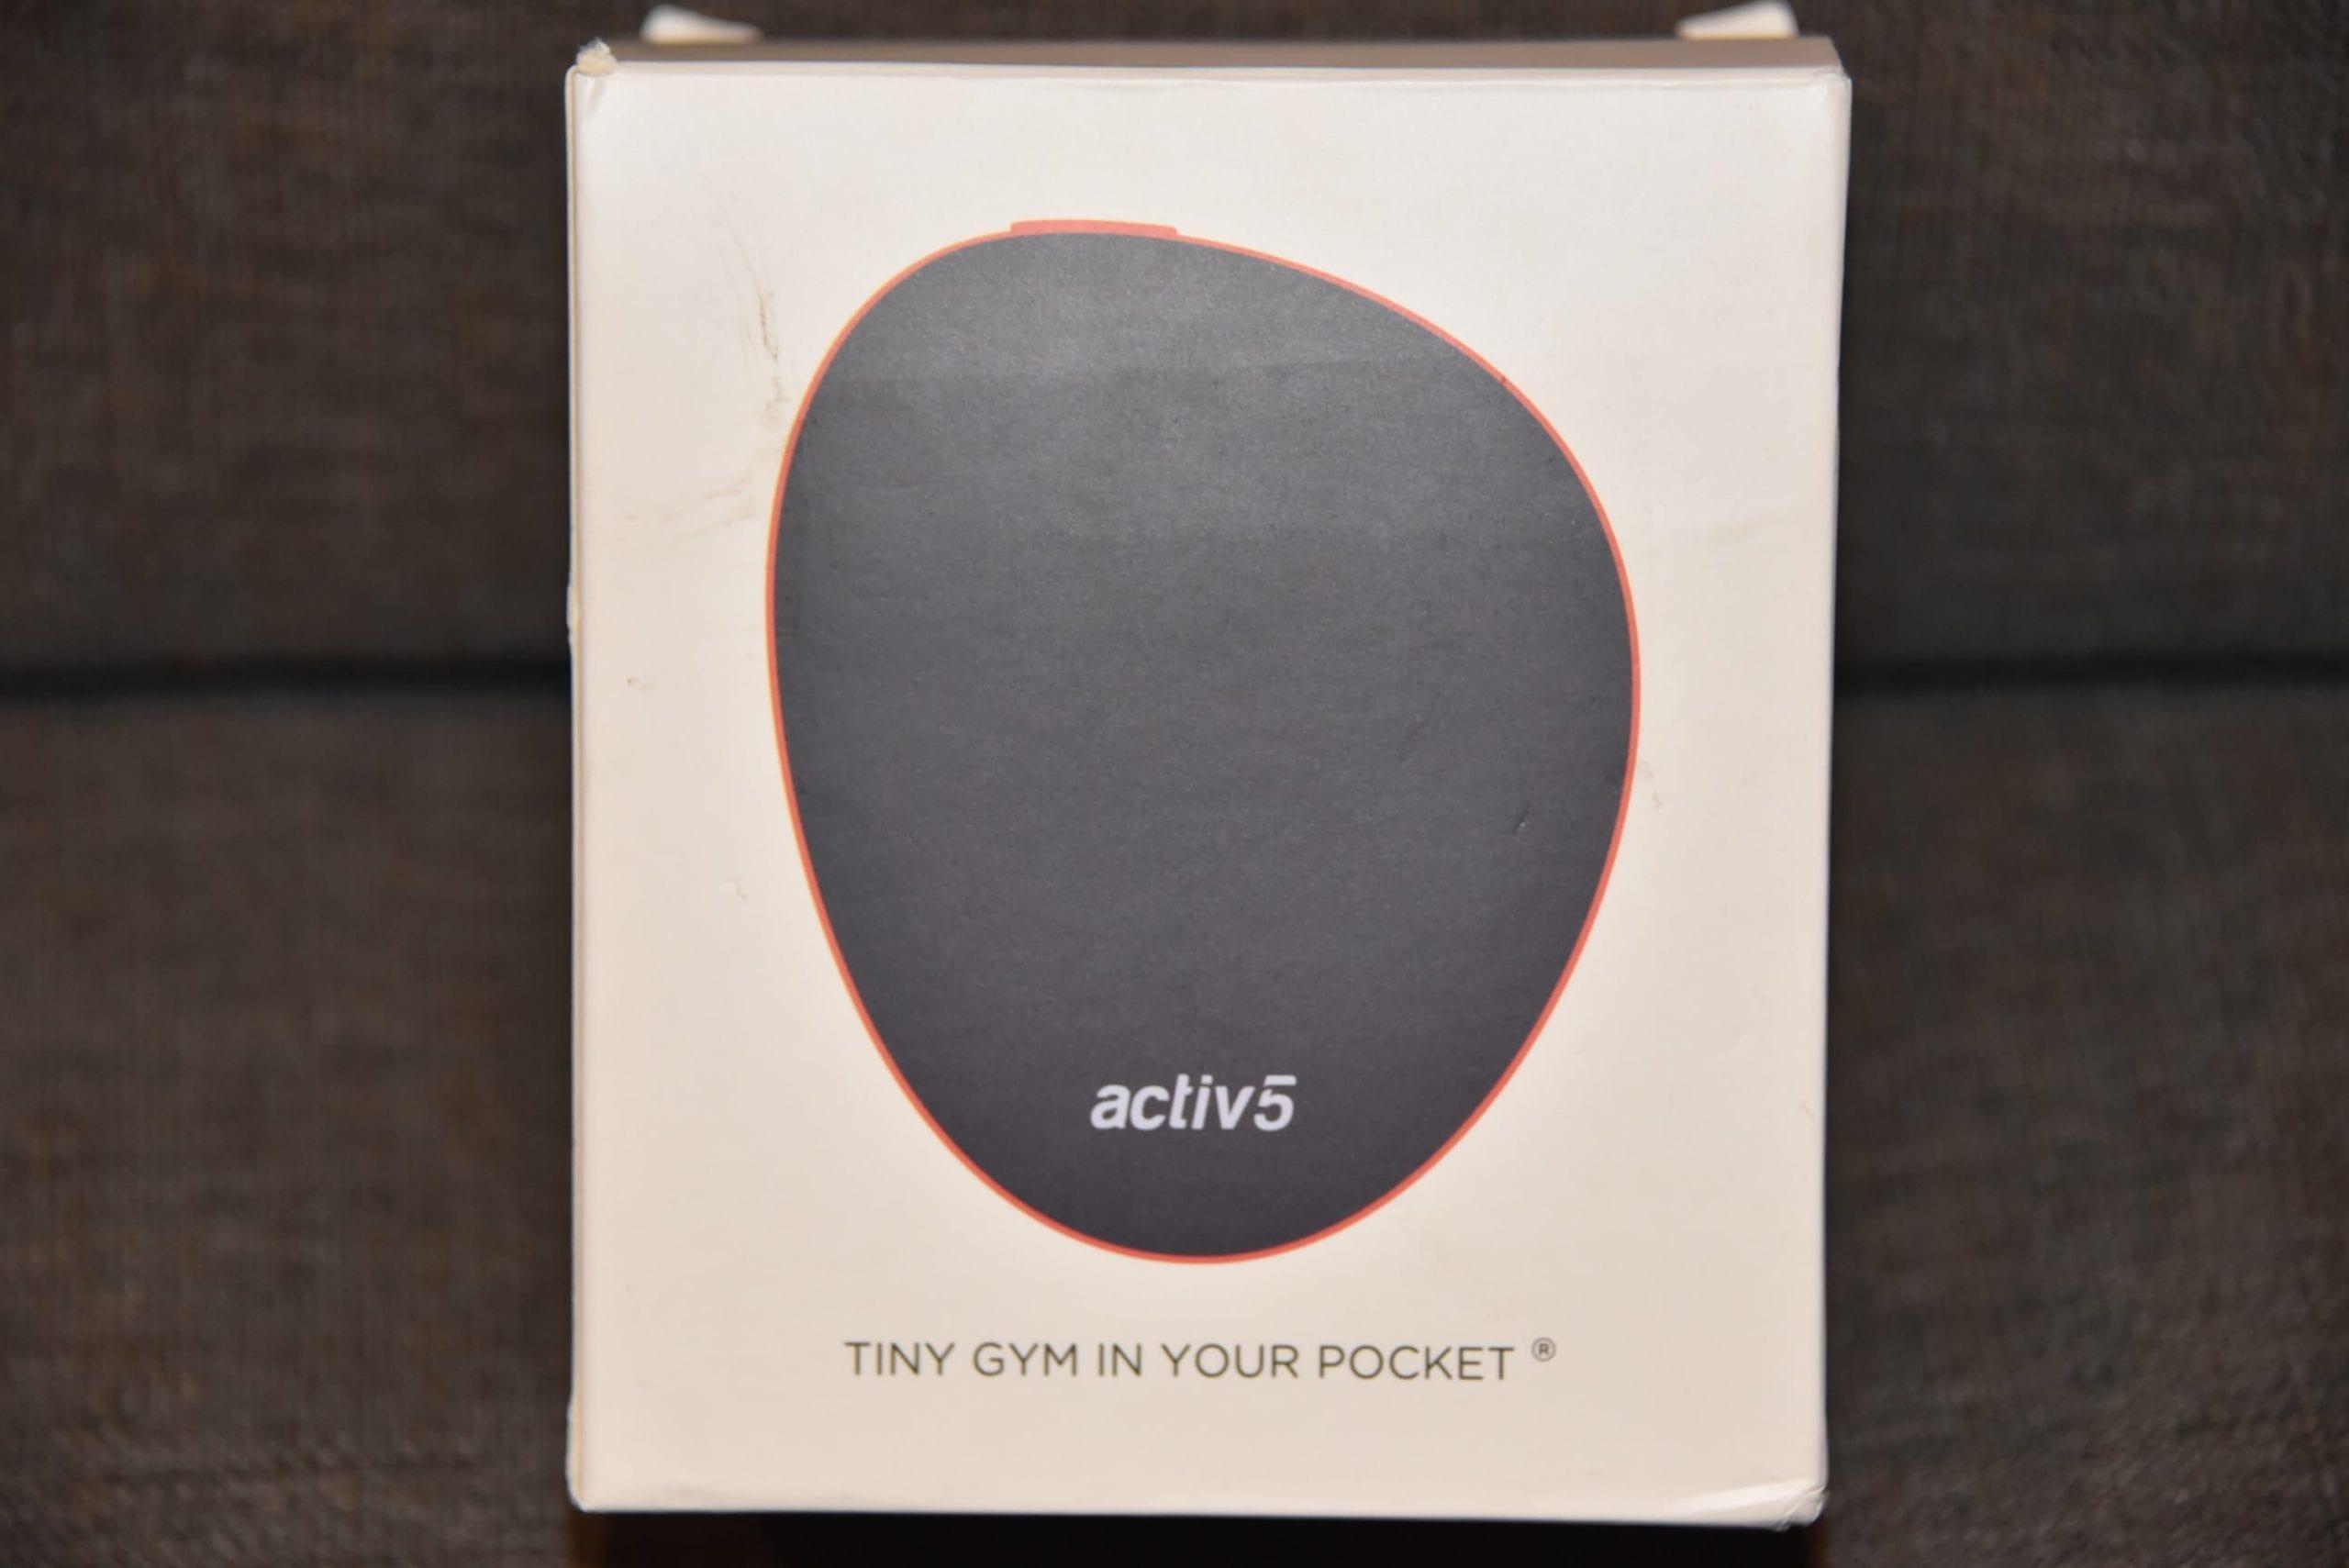 Activ5 Portable Workout Device